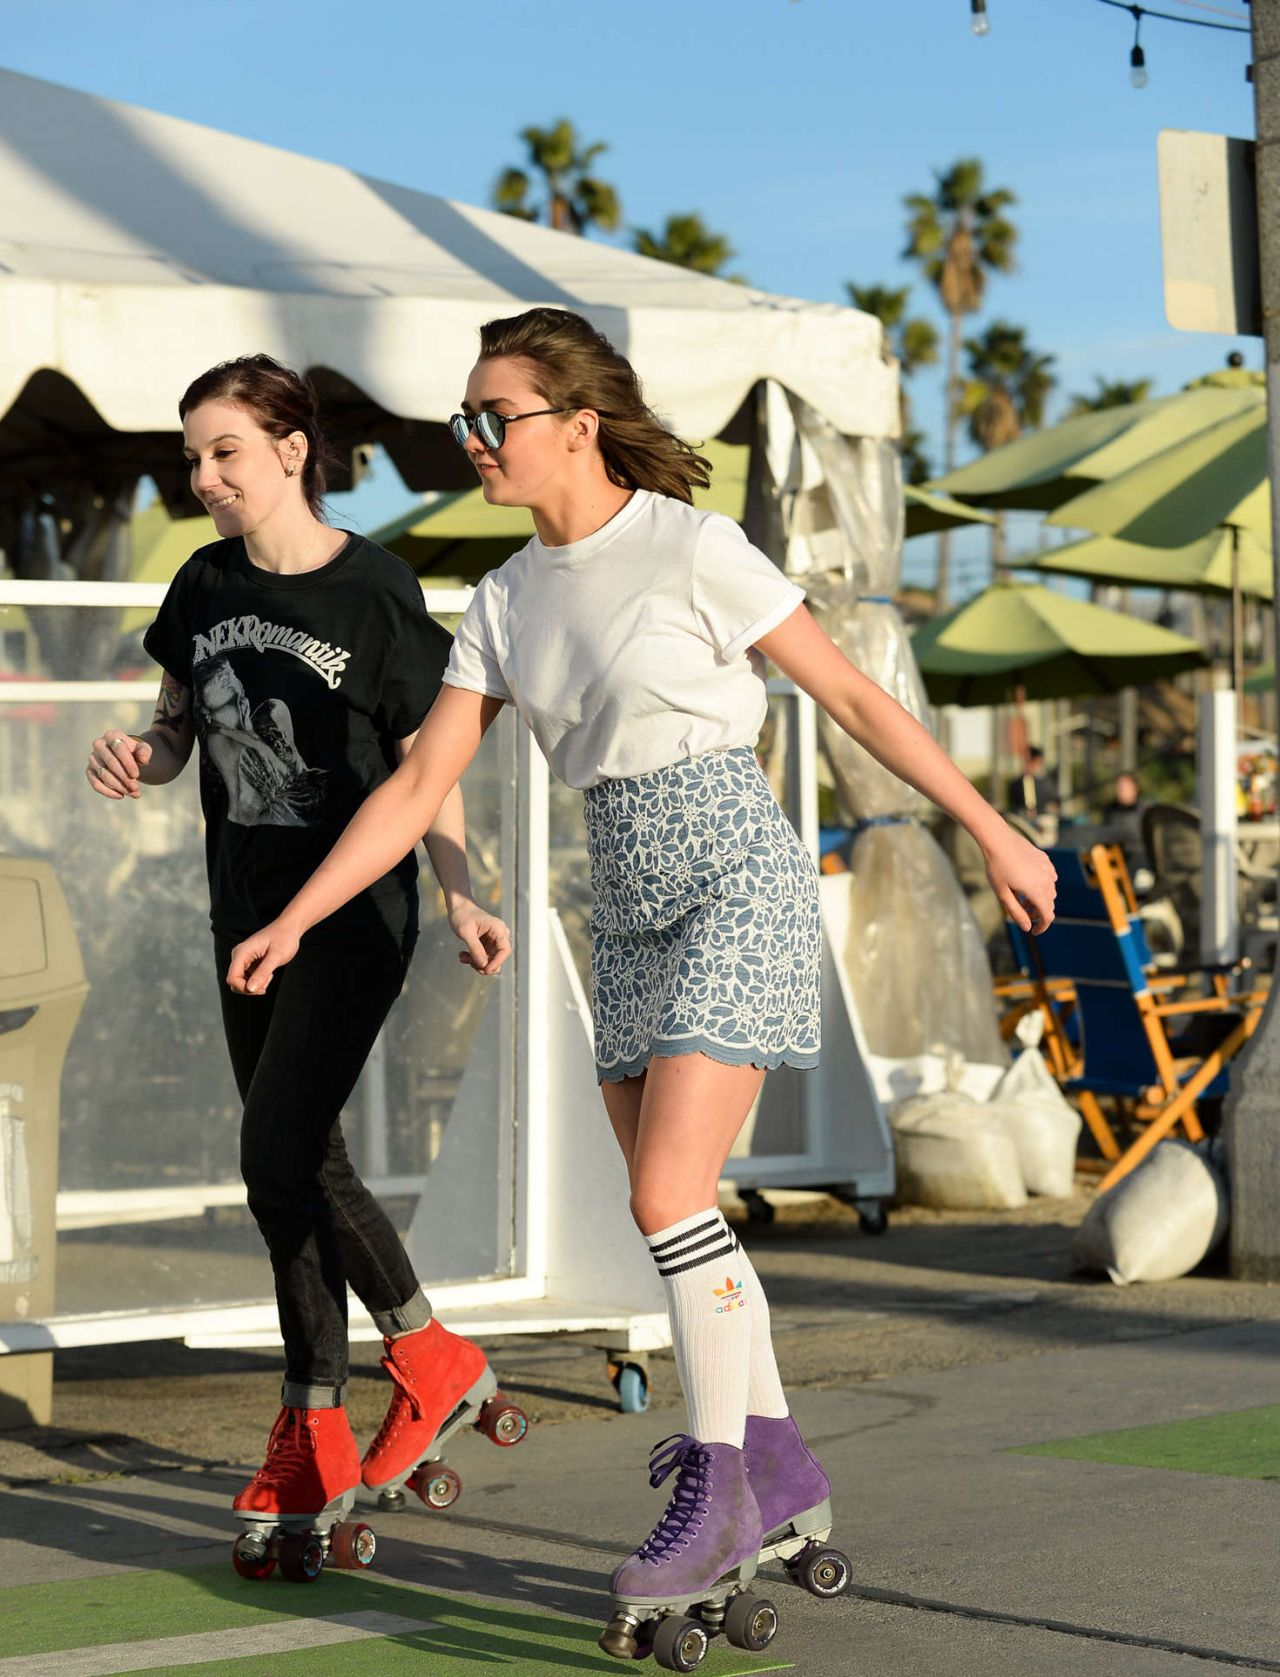 Roller skating kendall - Maisie Williams Roller Skating In Santa Monica January 2016